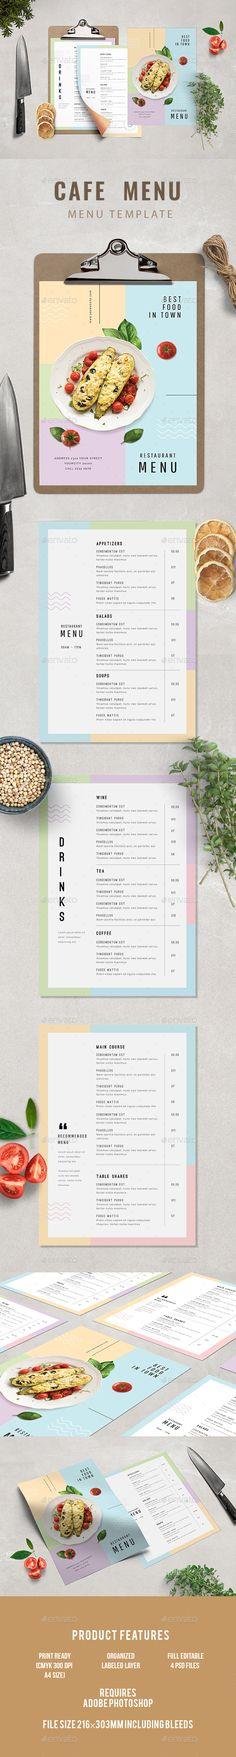 Cafe Menu — Photoshop PSD #cafe #simple food menu • Download ➝ https://graphicriver.net/item/cafe-menu/20469652?ref=pxcr